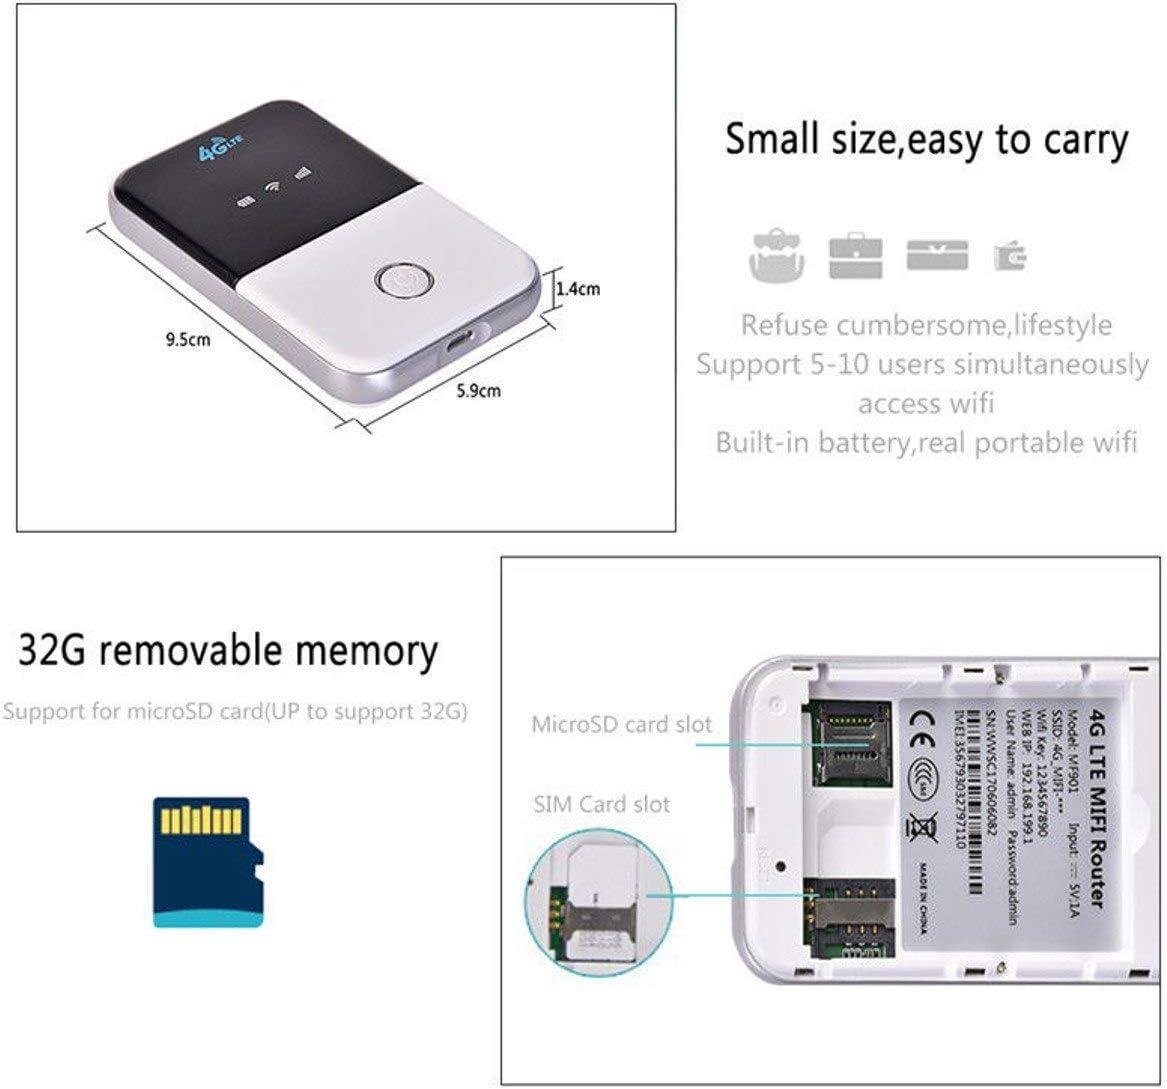 Sala-Deco 4G LTE Mobile WiFi Wireless Pockets spot Router Modem Broadband